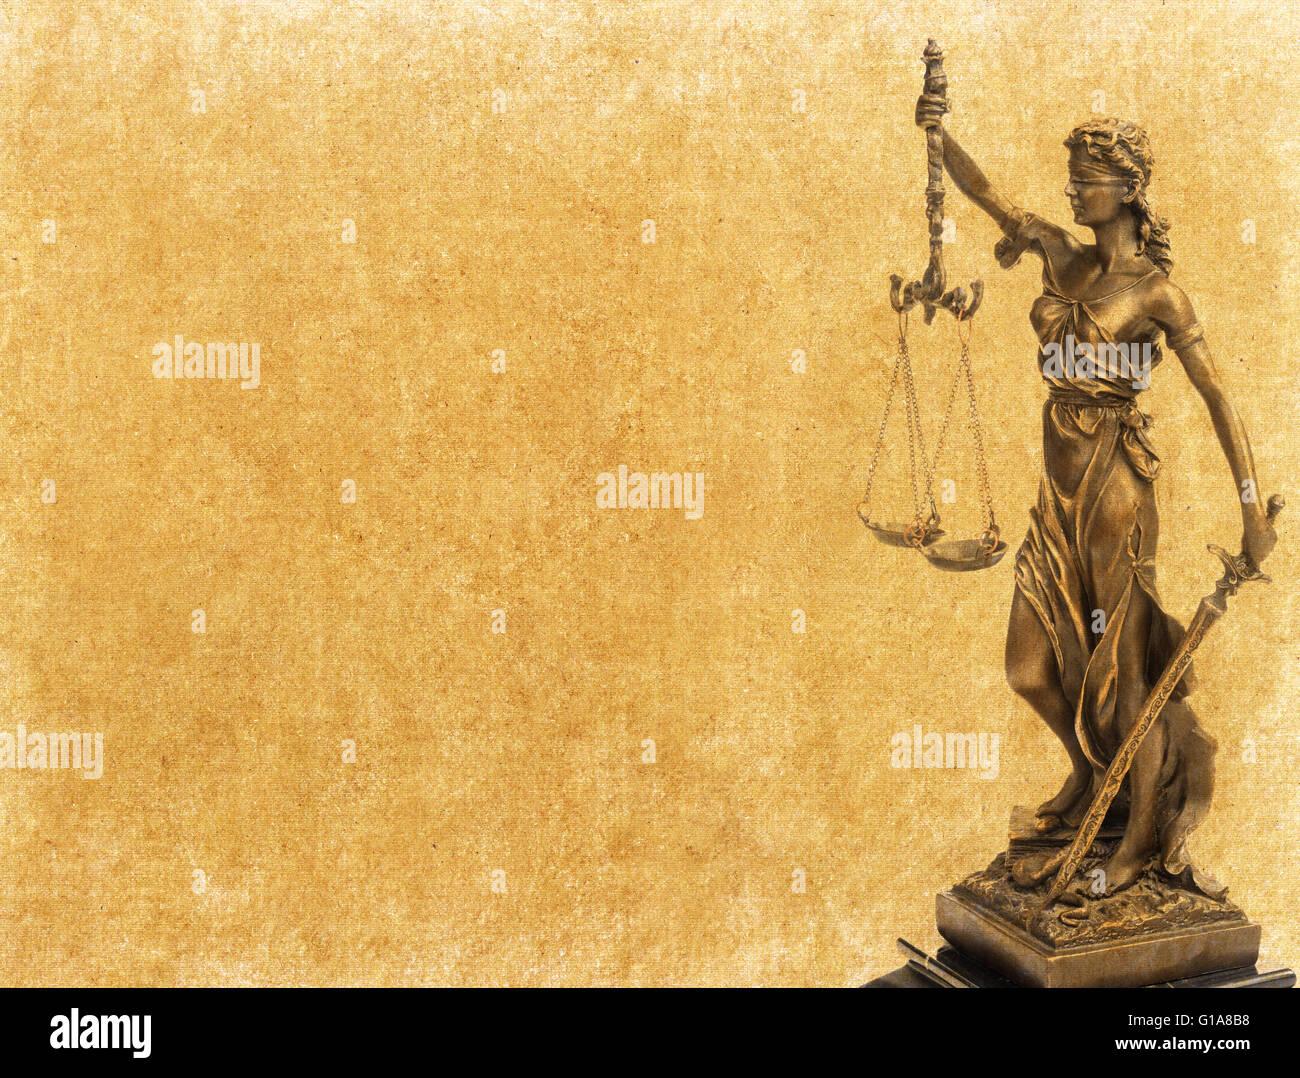 justice paper